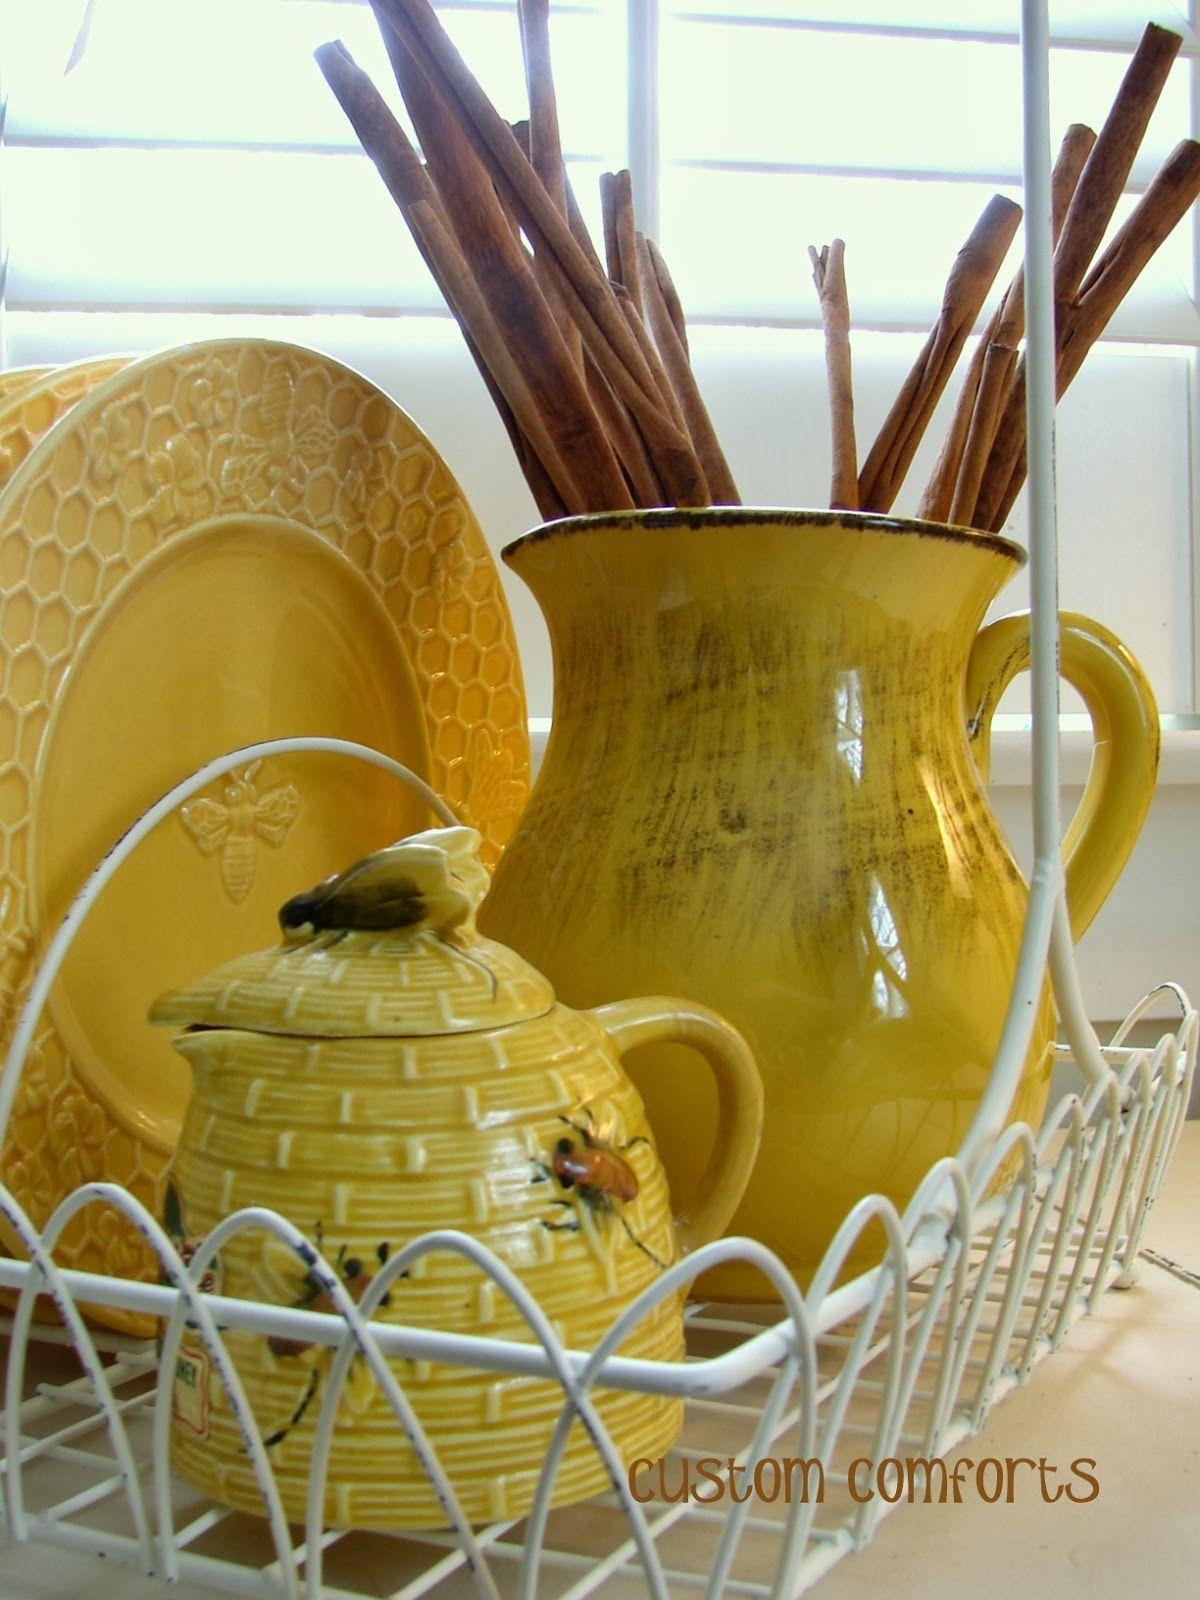 bee dinnerware u0026 honey pot & bee dinnerware u0026 honey pot | Iu0027ll Bee | Pinterest | Bees Honey and ...